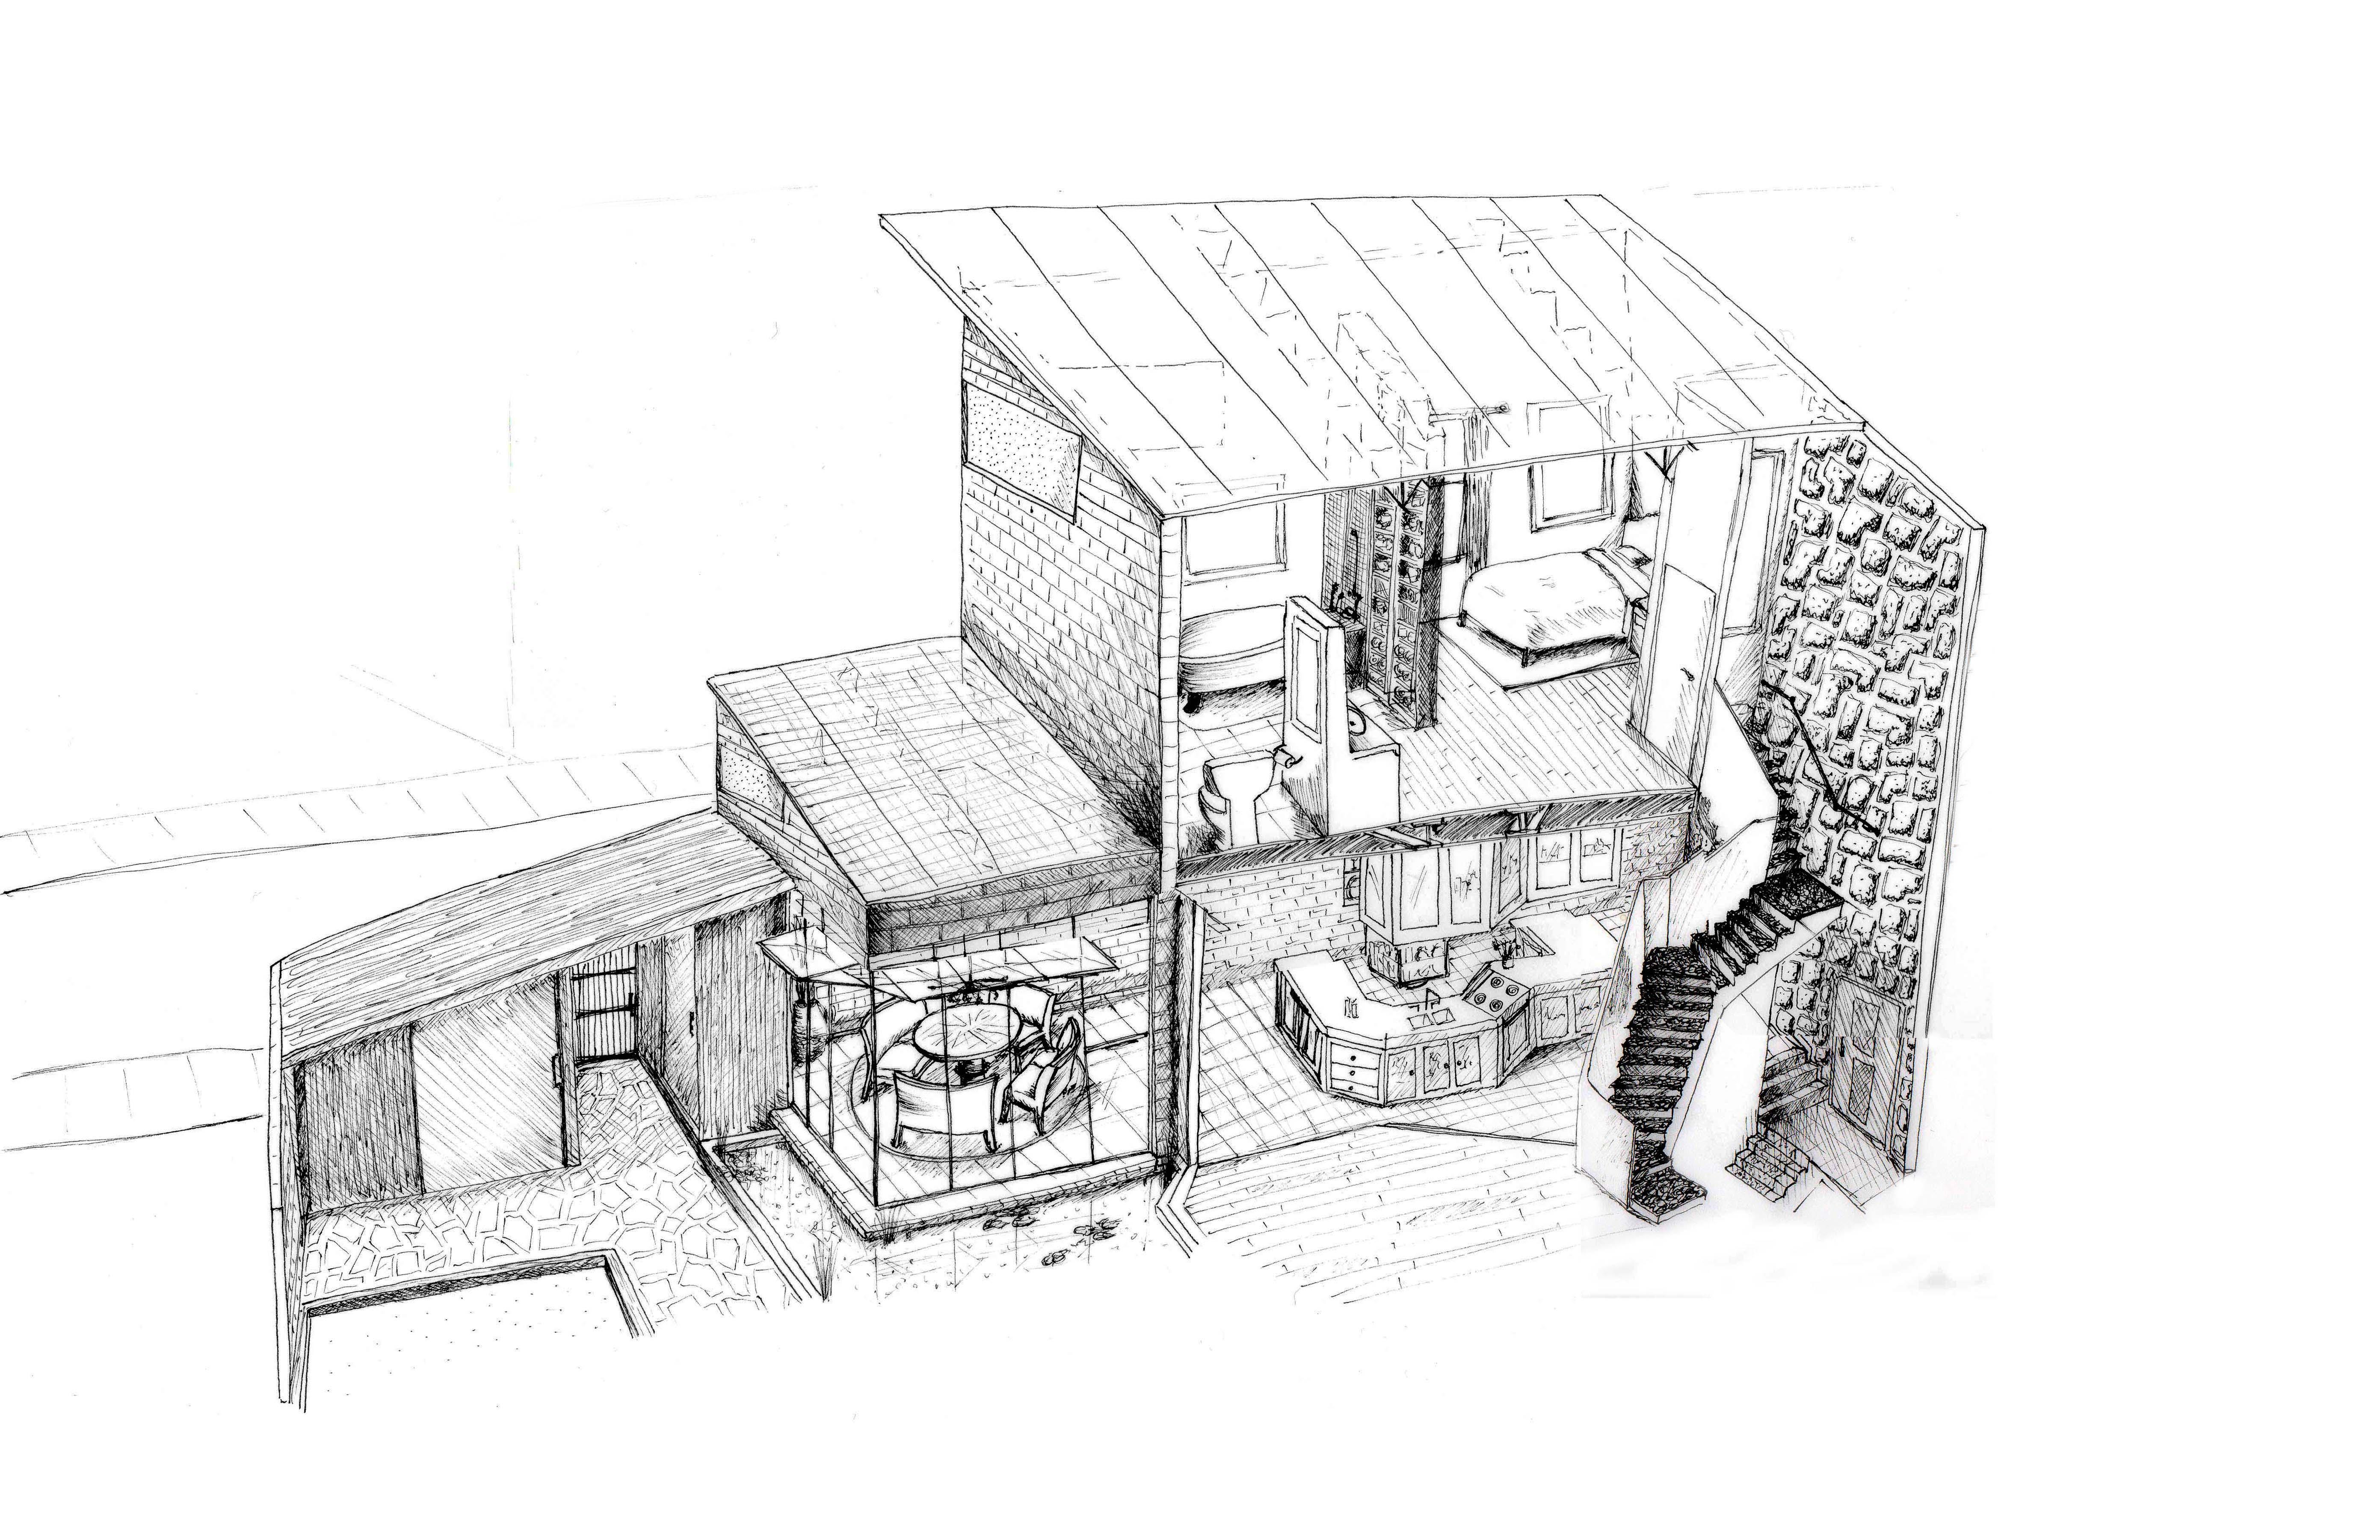 Drawing of interior